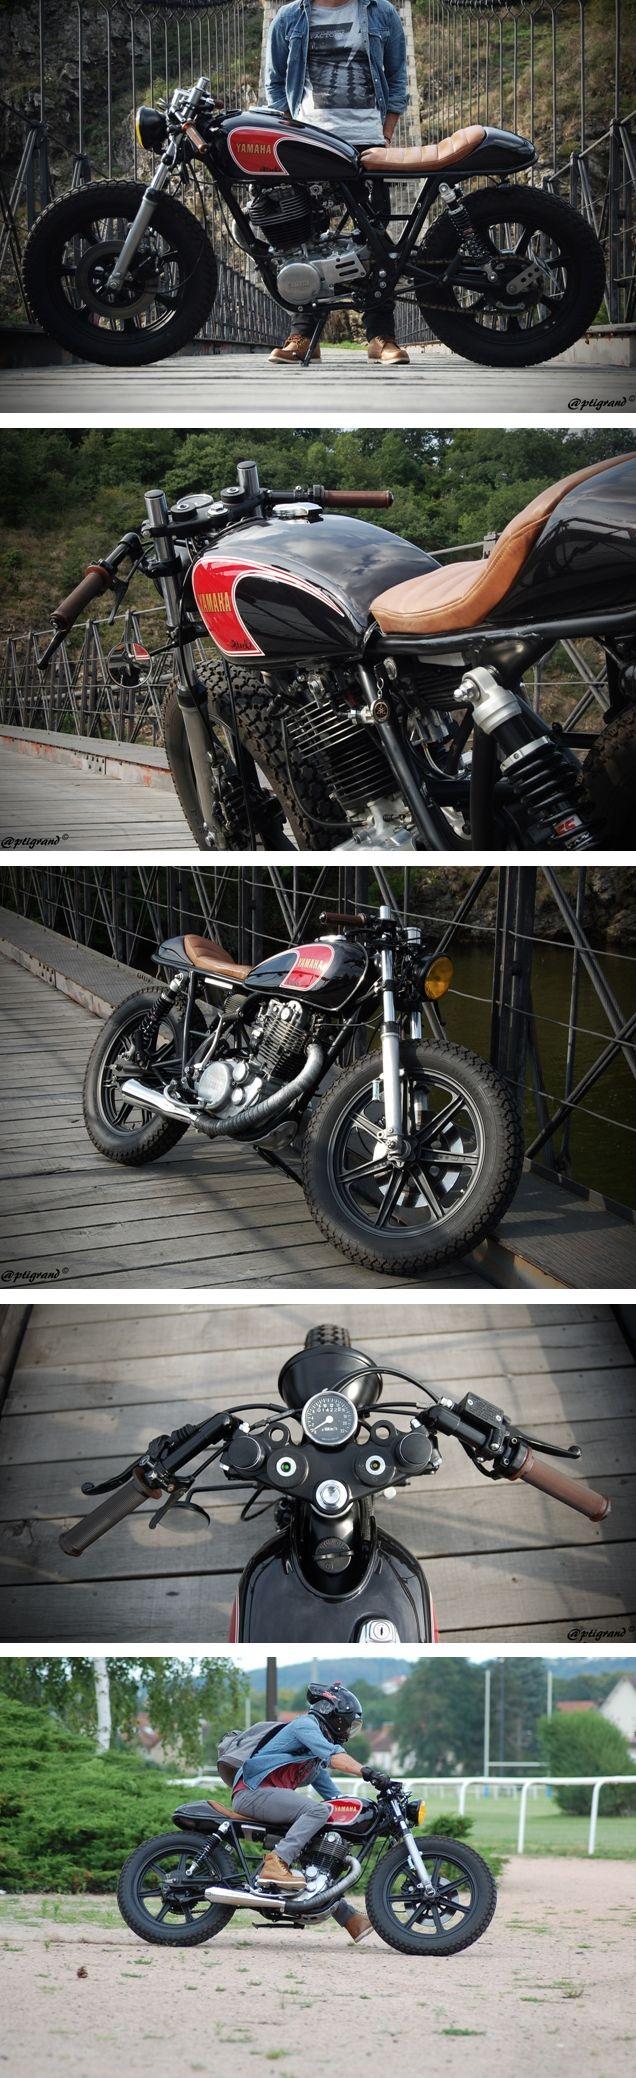 Yamaha SR 400 de 1982 par Nicolas A. - http://4h10.com/2014/08/yamaha-sr-400-iblackz/